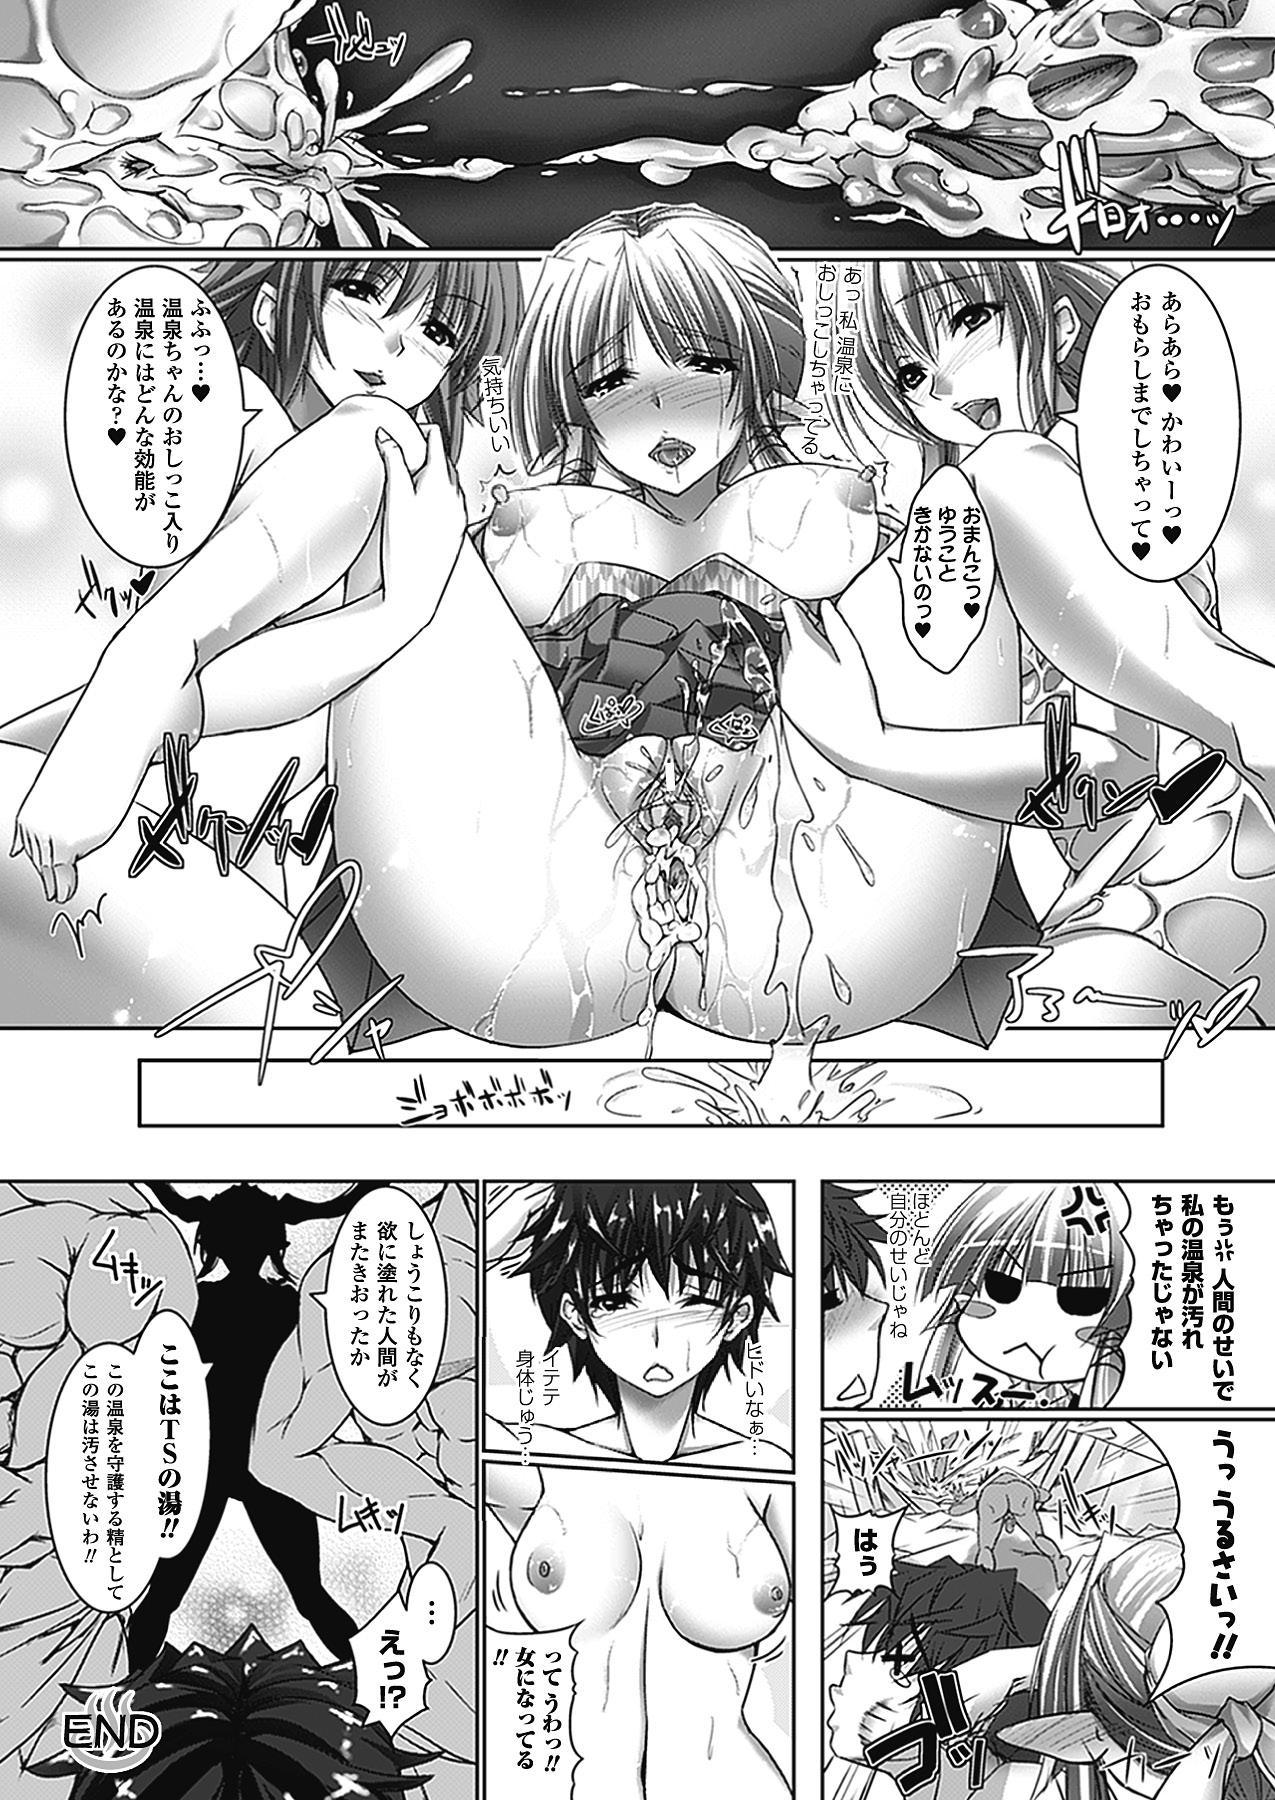 Amai Kuchibiru Torokeru Kuchibiru 71